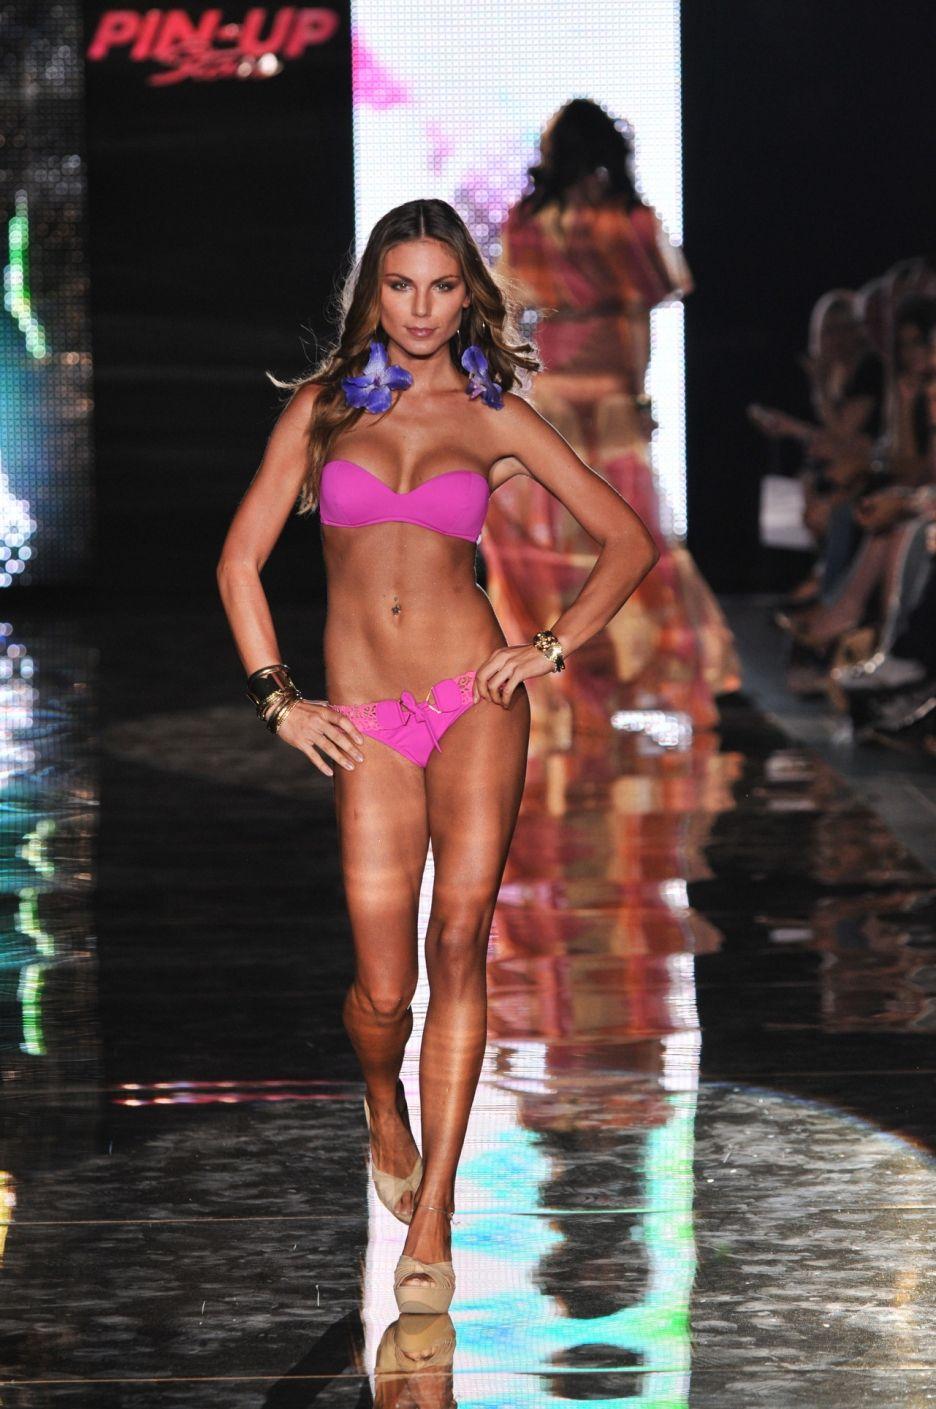 Bikini Marina Calabro nudes (12 foto and video), Ass, Fappening, Selfie, lingerie 2020